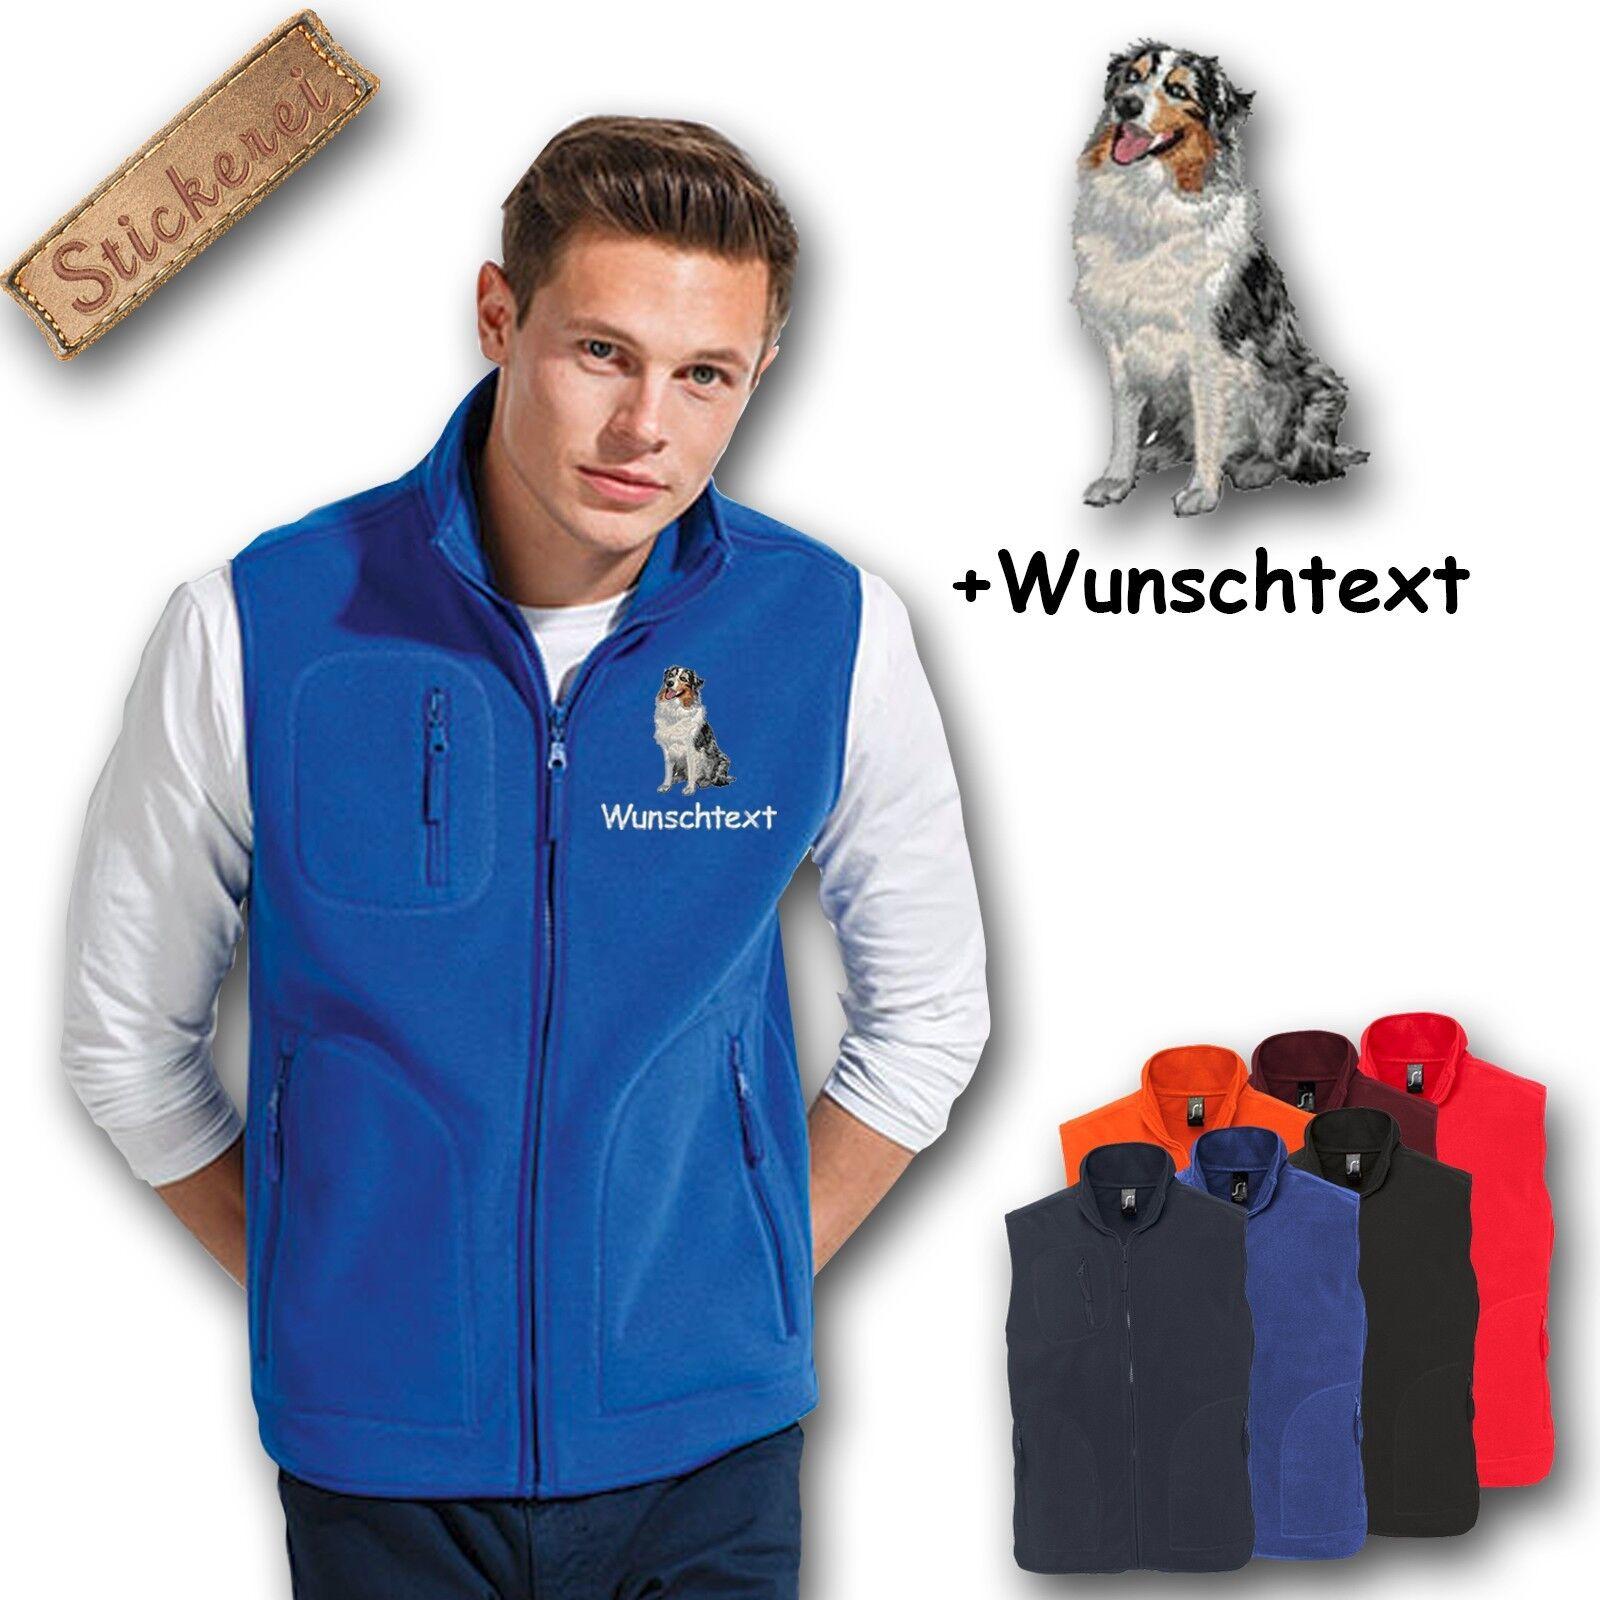 2a3c4148e Vest Embroidered Embroidery Australian Shepherd + Name Dog Fleece ...